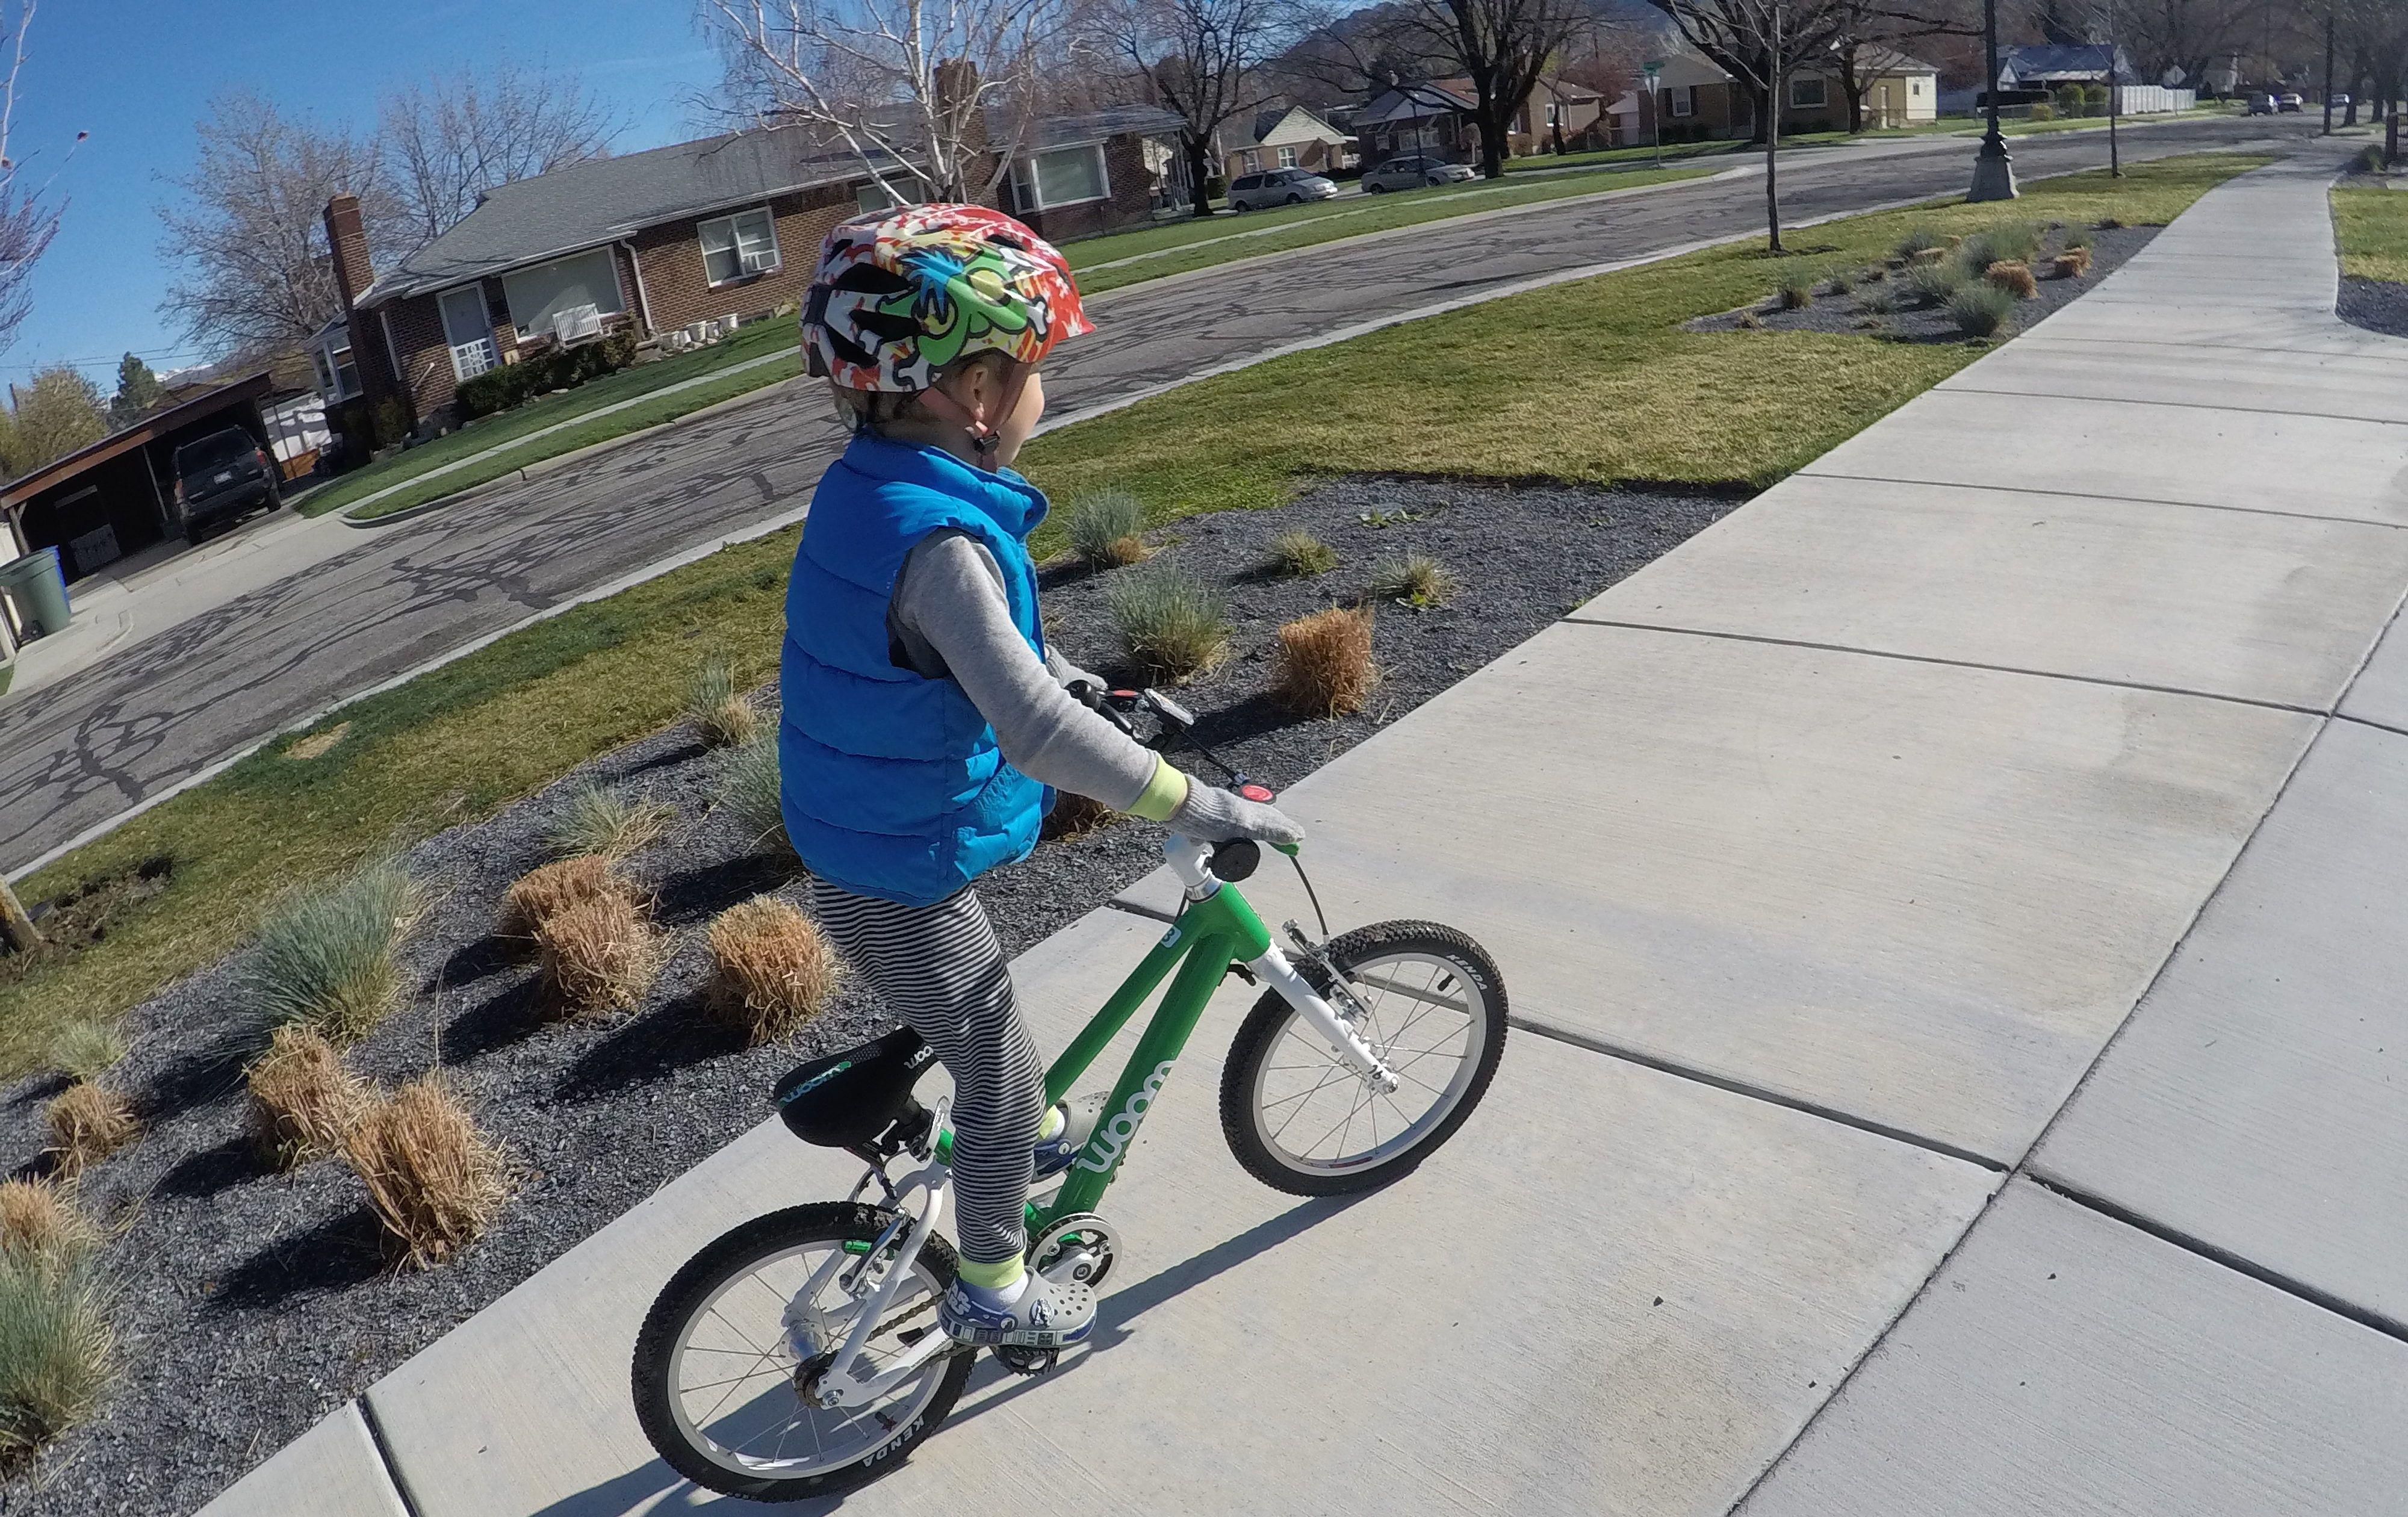 Woom 3 Kids 16 Bike Review Rascal Rides Bike Reviews Kids 3